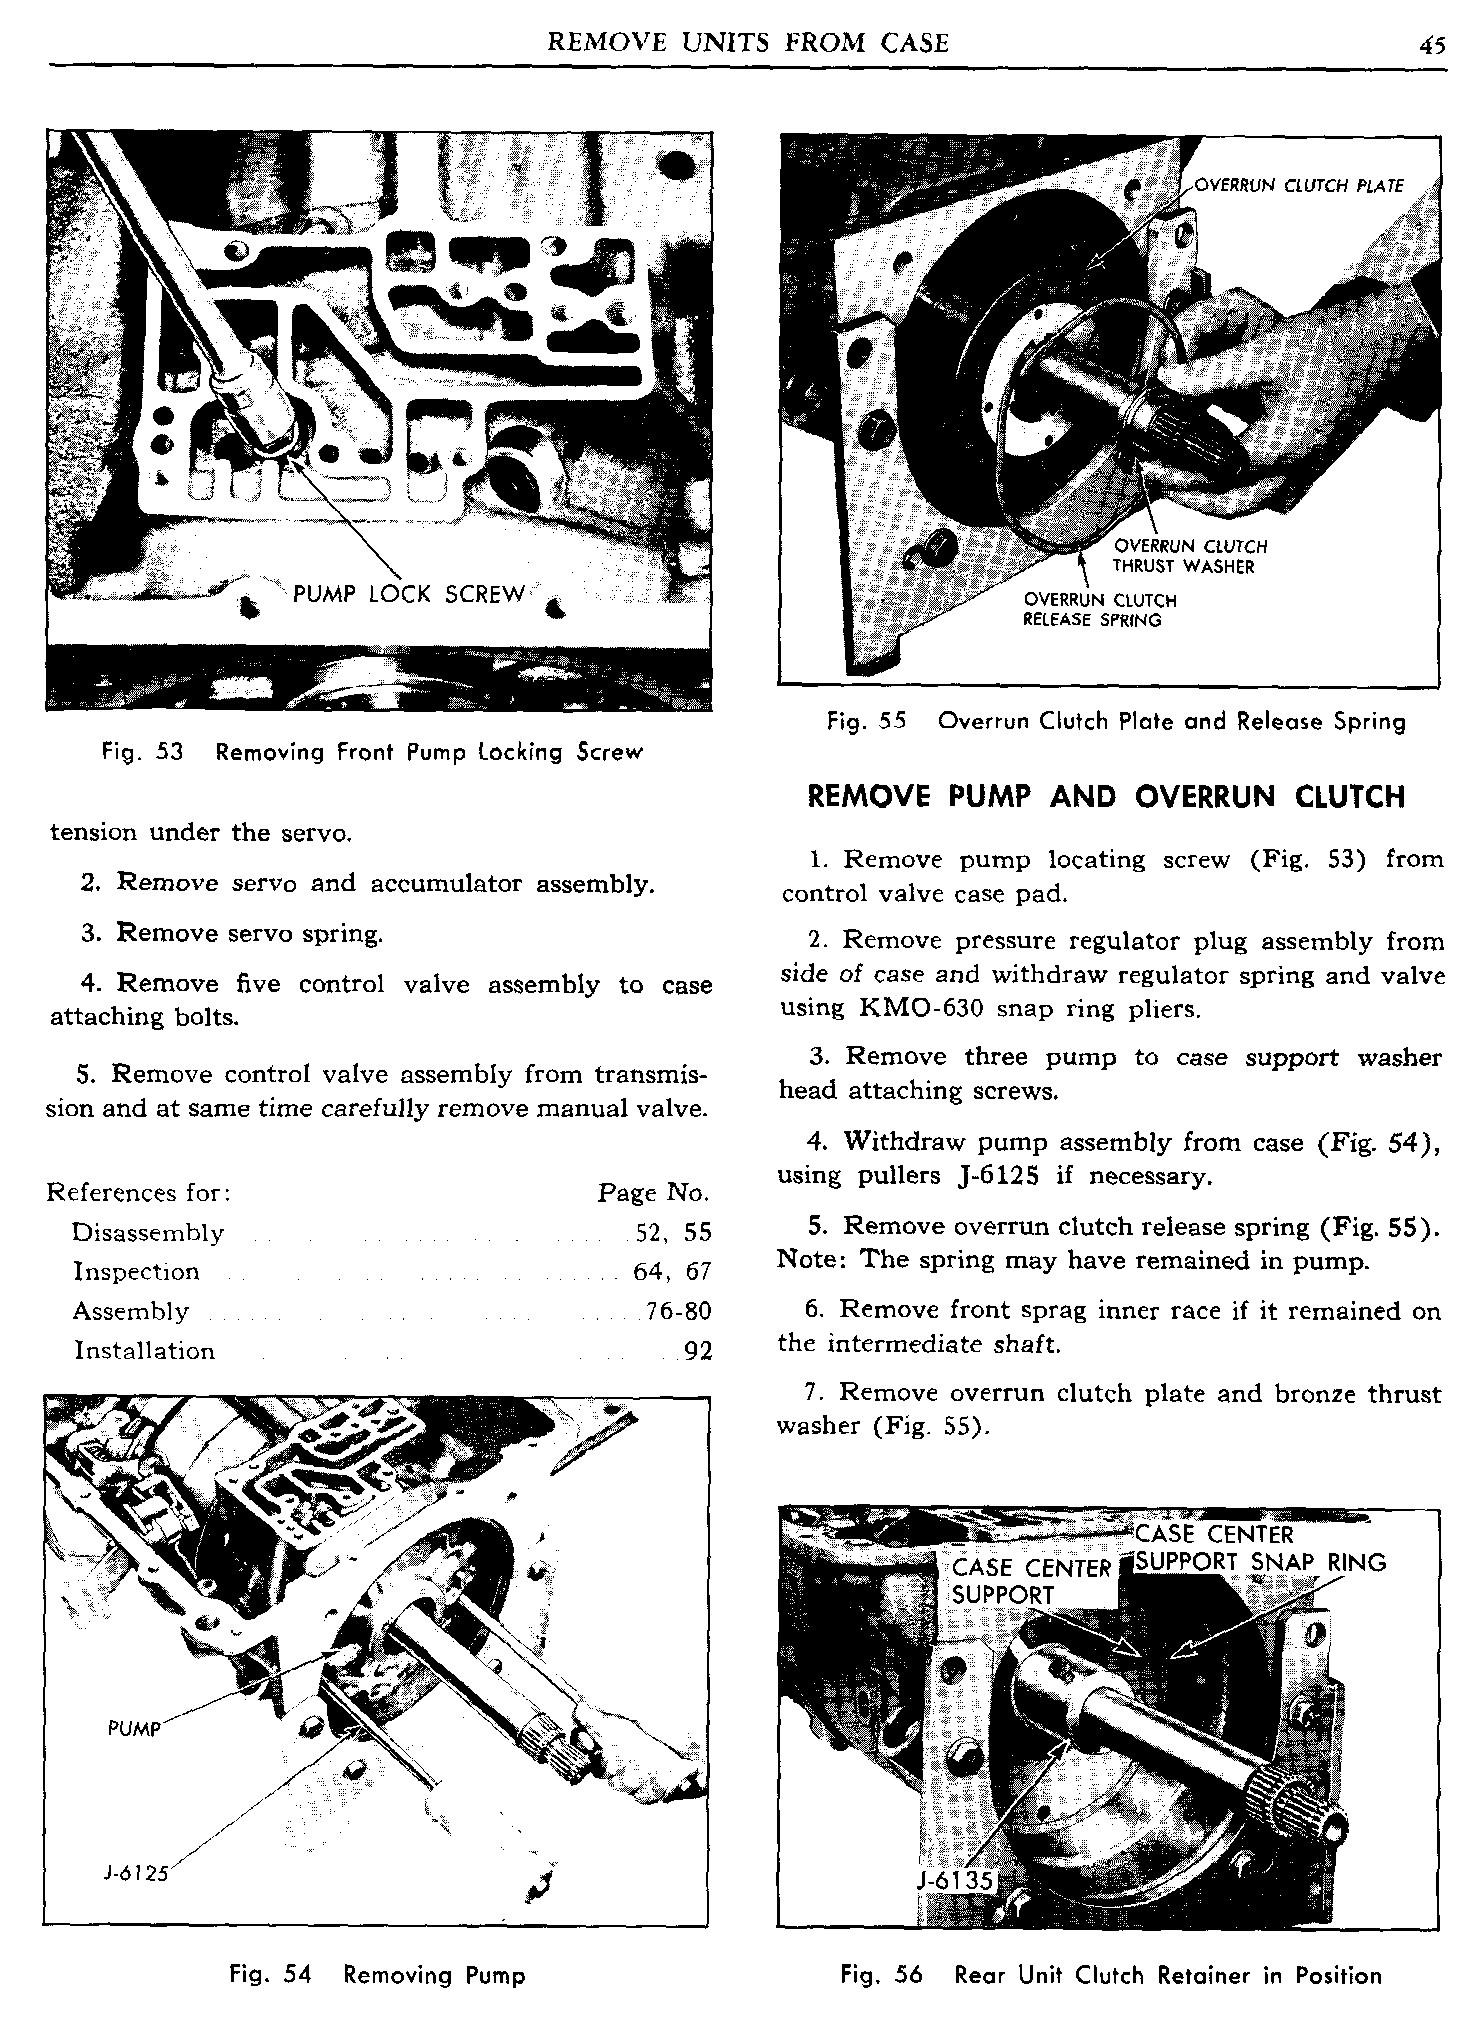 1960 Pontiac Shop Manual- Hydra-Matic Page 45 of 112